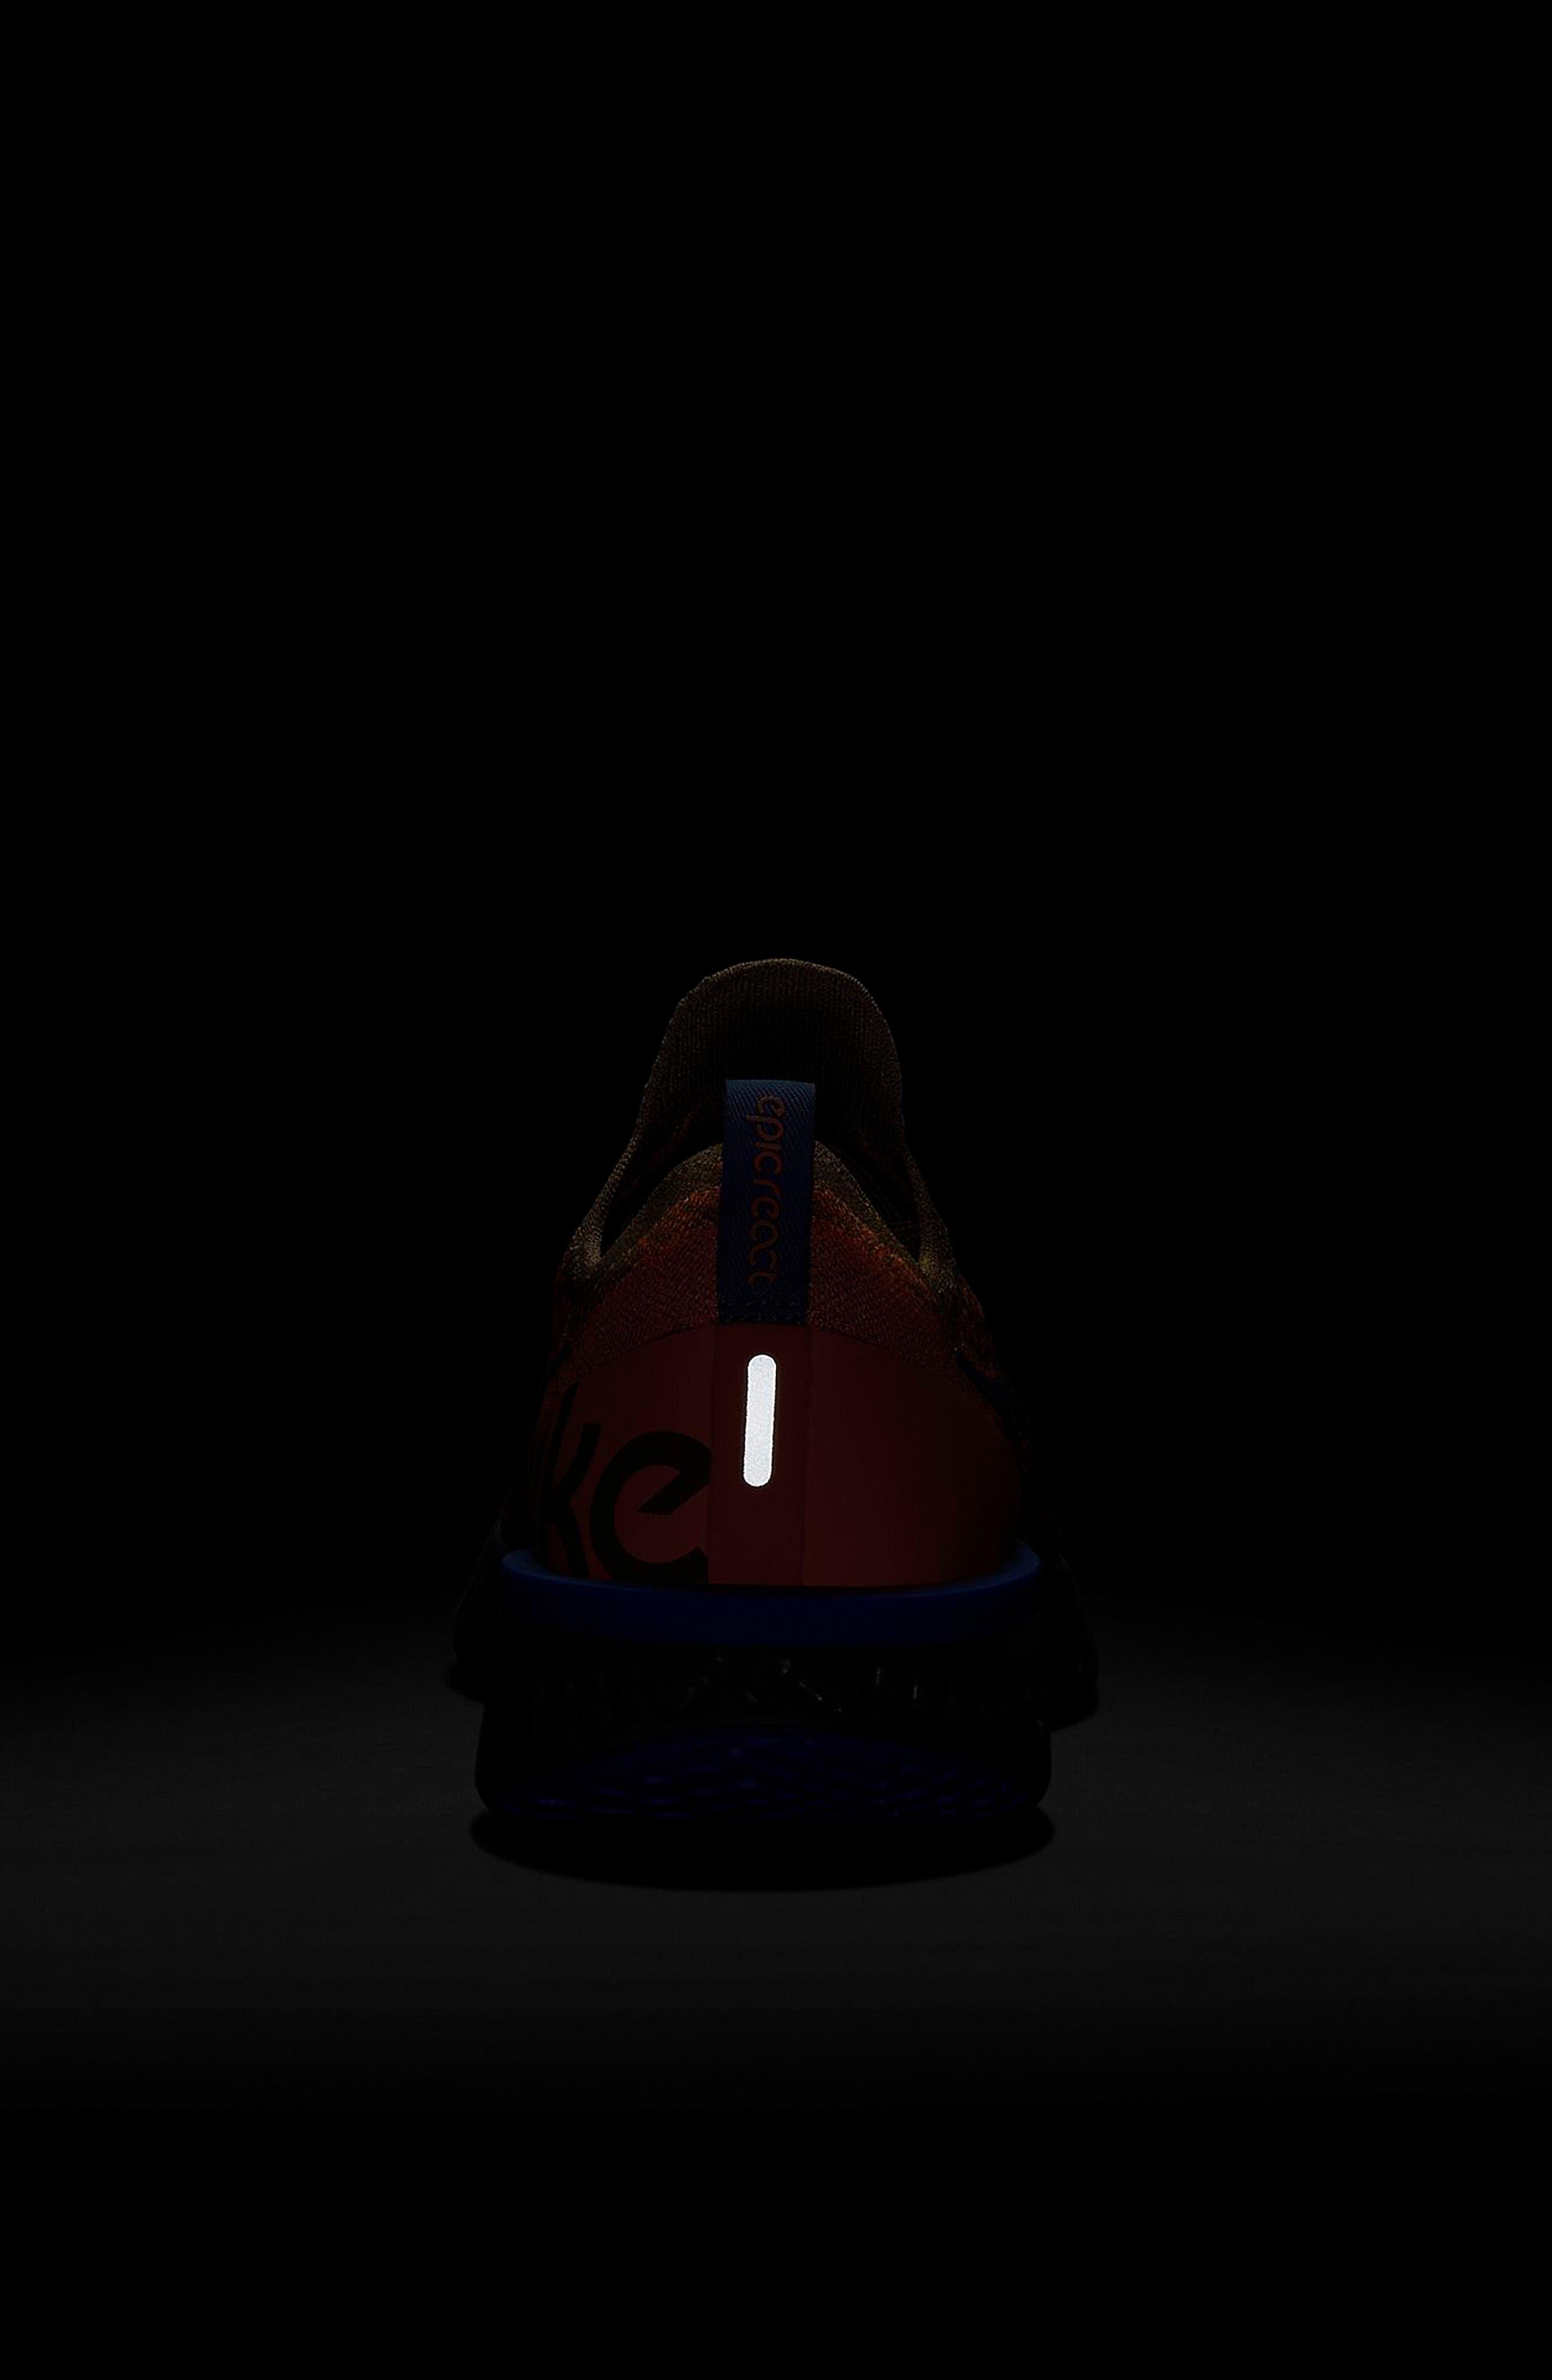 Epic React Flyknit Running Shoe,                             Alternate thumbnail 6, color,                             GOLDEN BEIGE/ BLUE/ ORANGE